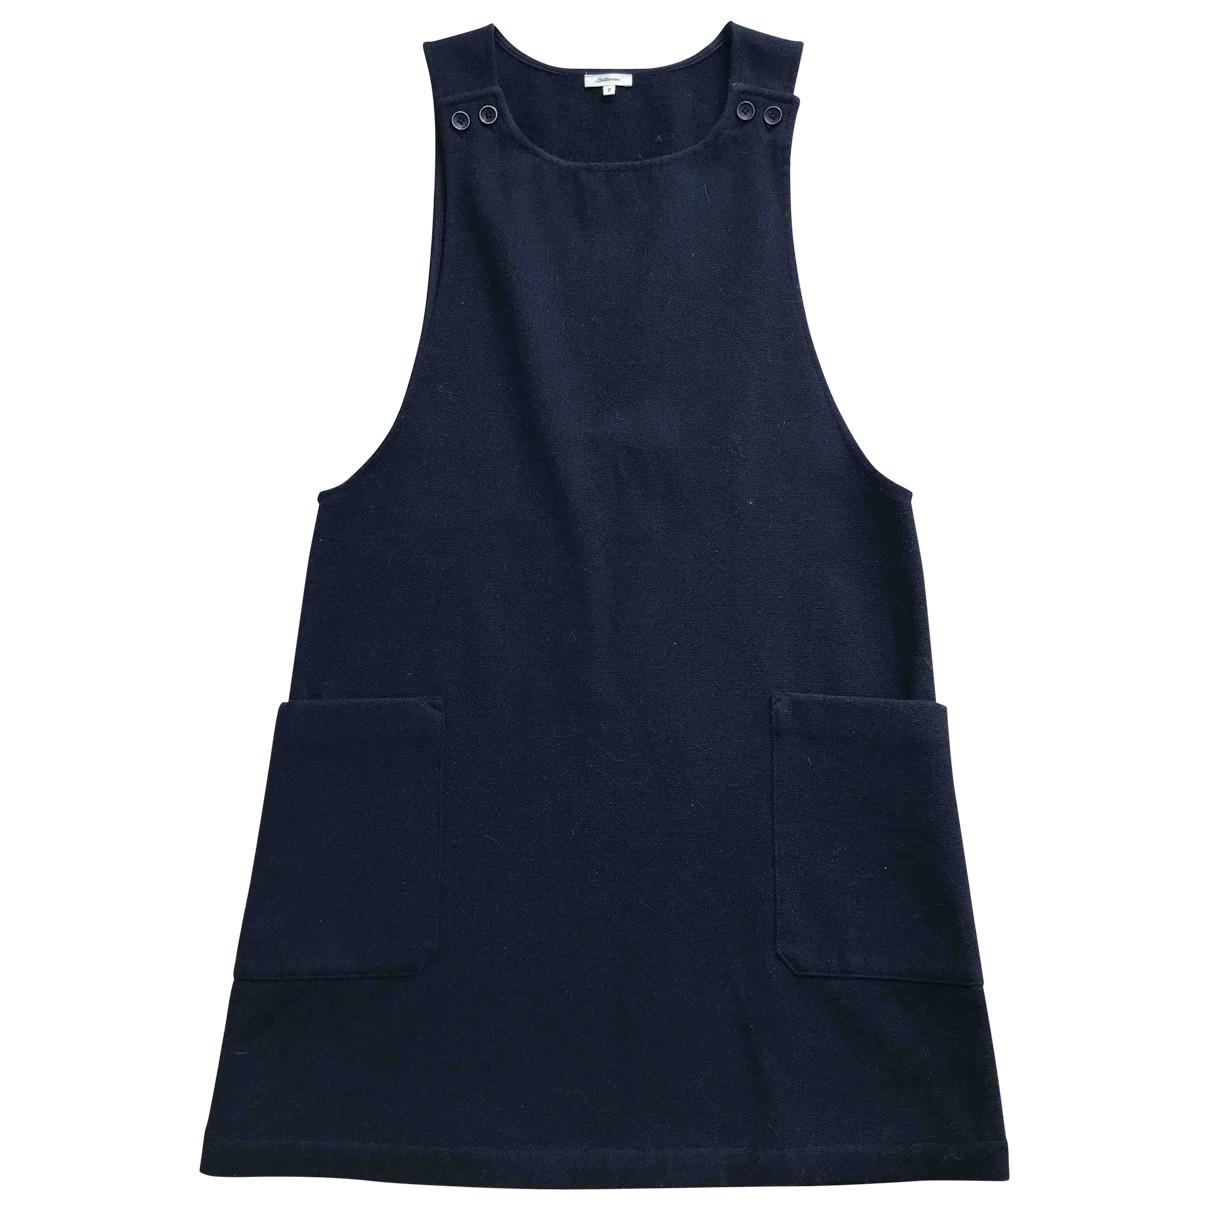 Bellerose - Robe   pour femme en laine - noir